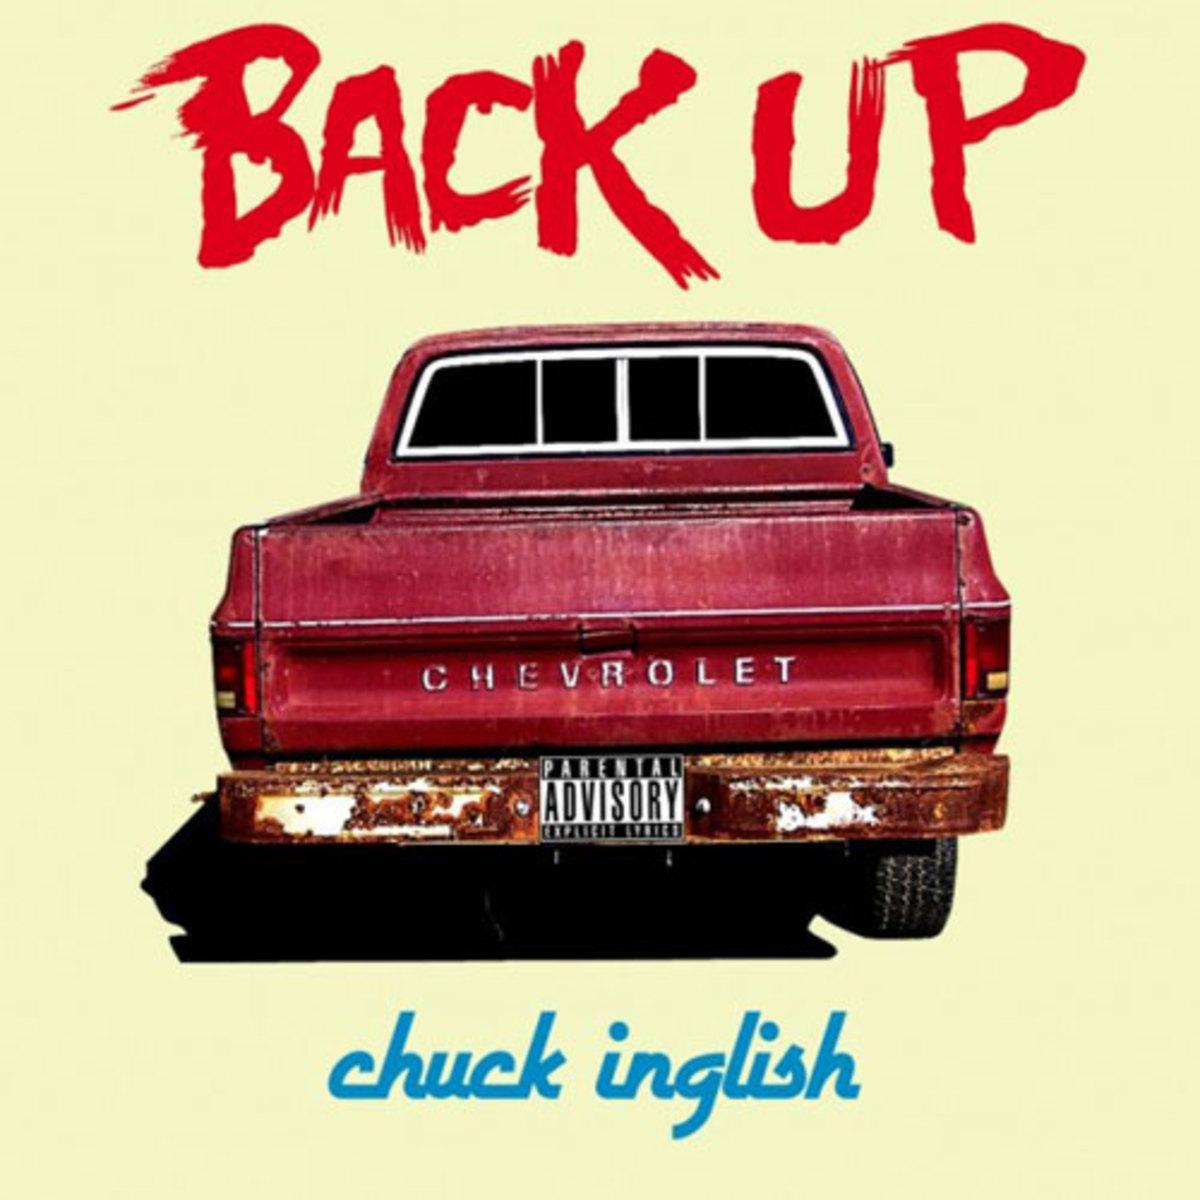 chuckinglish-backup.jpg